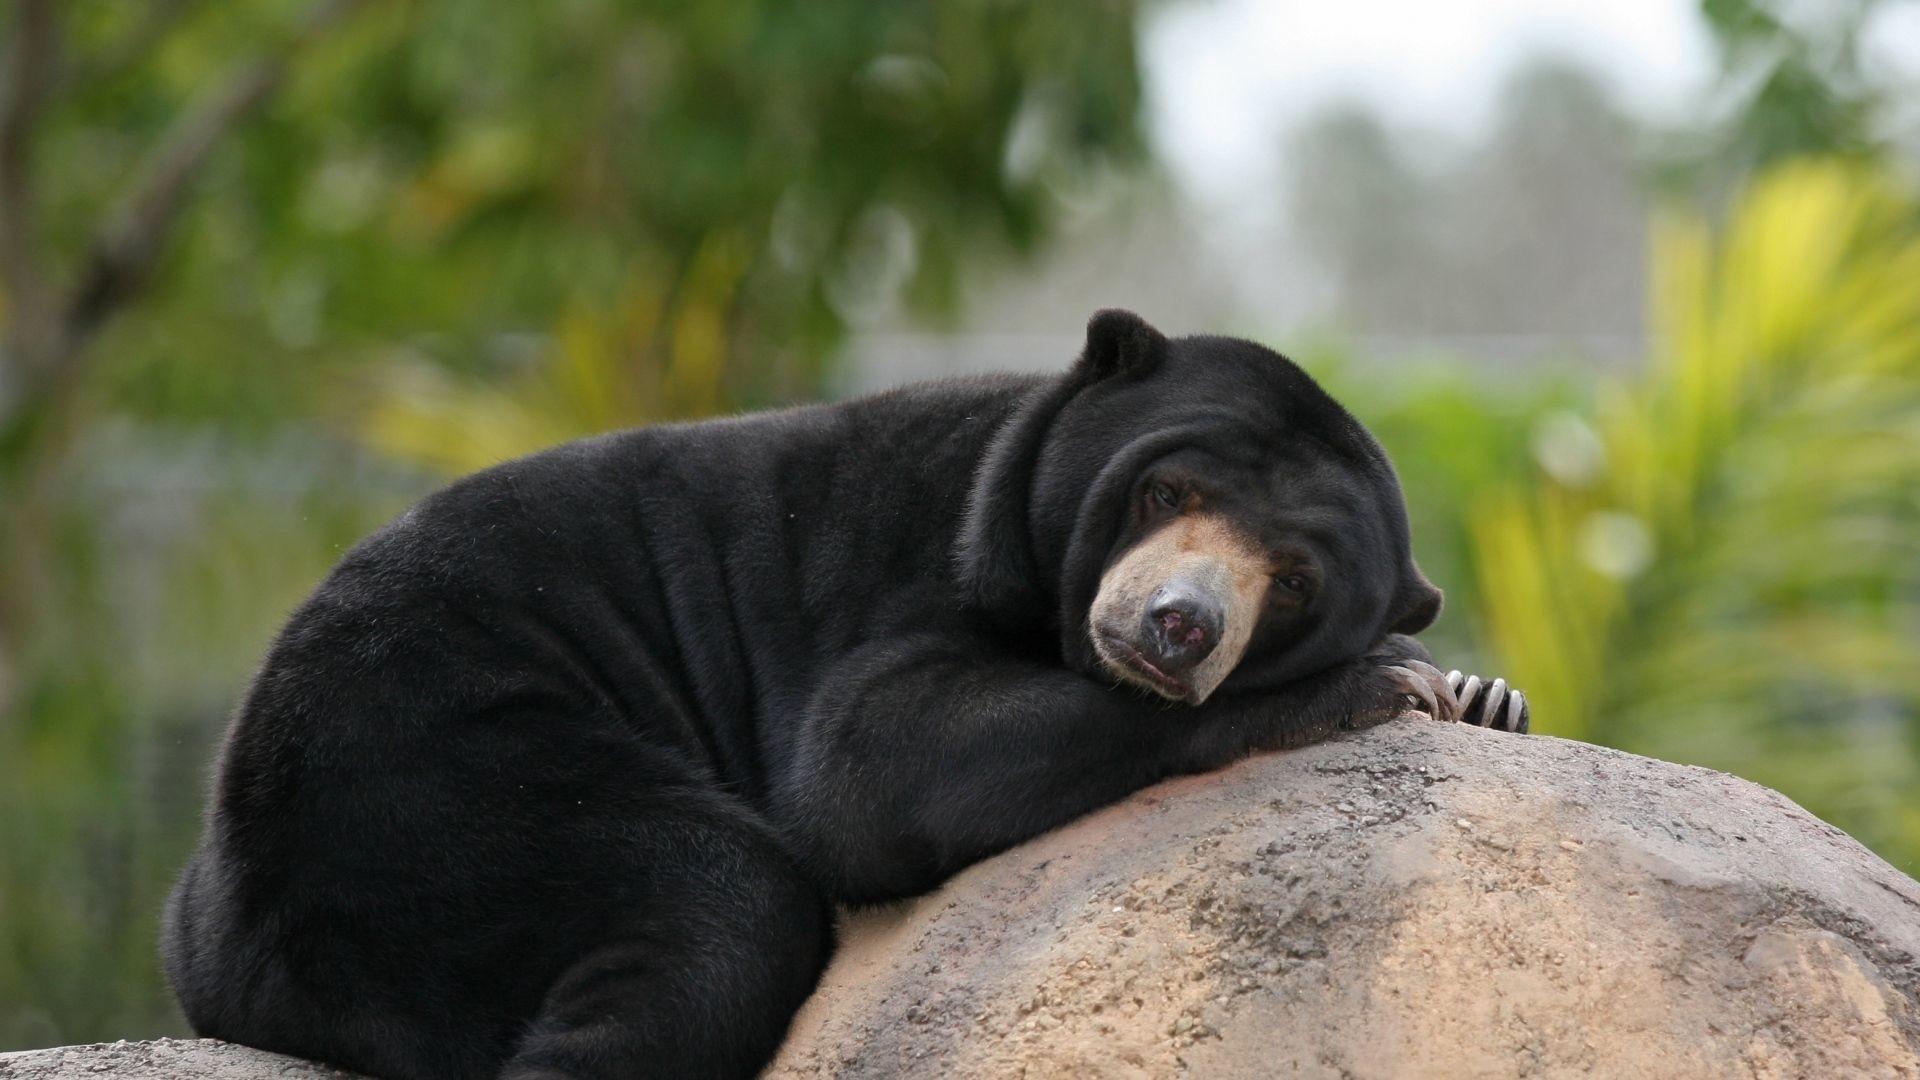 Black Bear High Quality